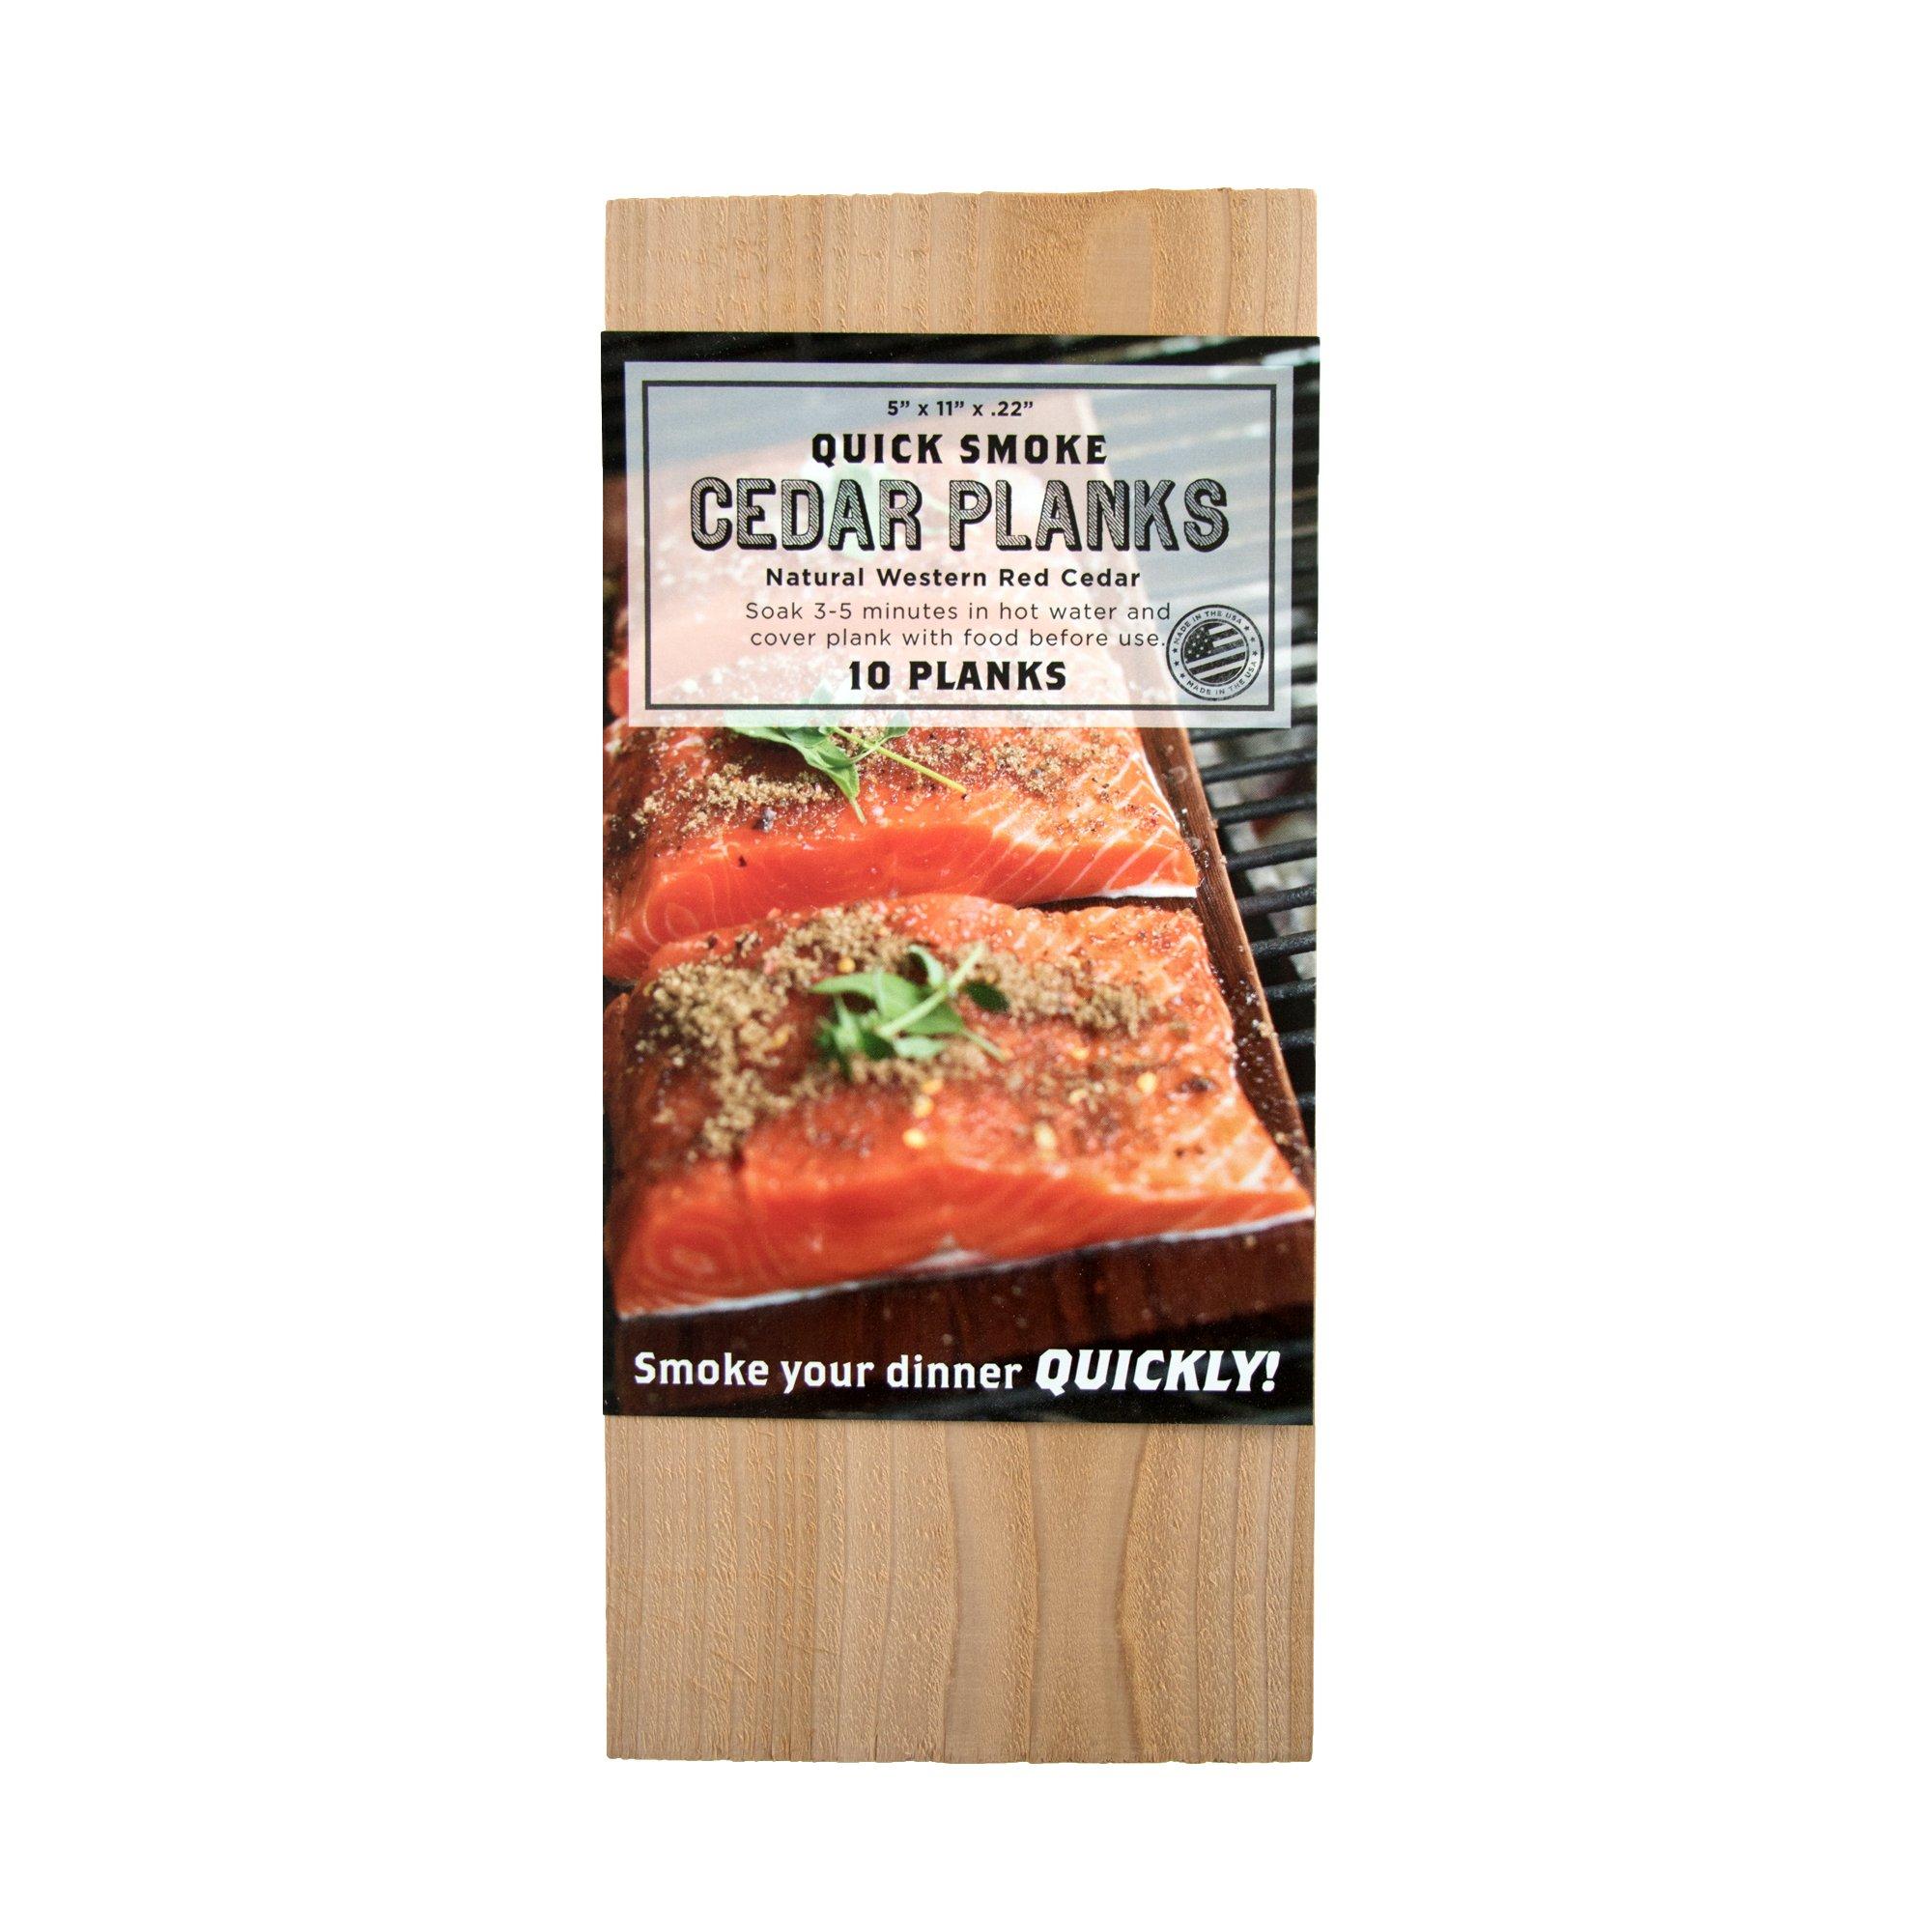 Quick Soak Cedar Grilling Planks - 5x11'' 10 Pack + Free Recipe eBook